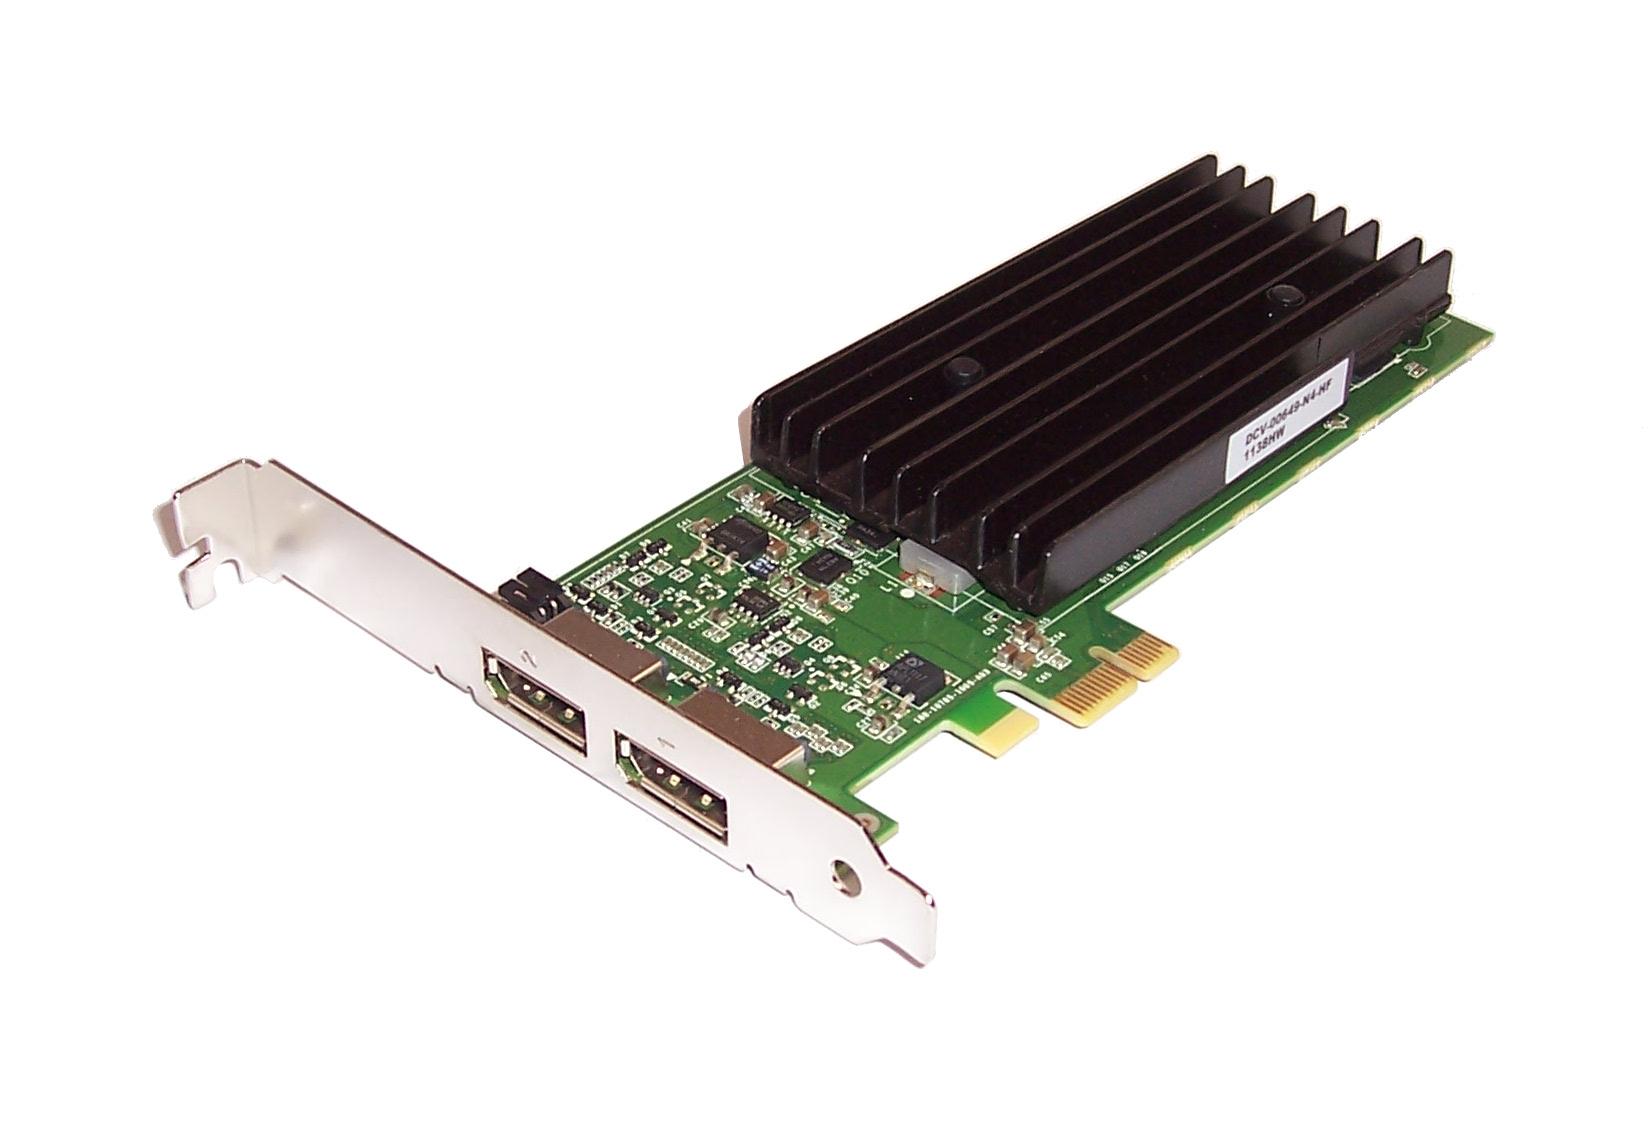 PNY VCQ295NVS-X1 nVidia Quadro NVS 295 256MB GDDR3 PCIe x1 Graphics Card 2xDP